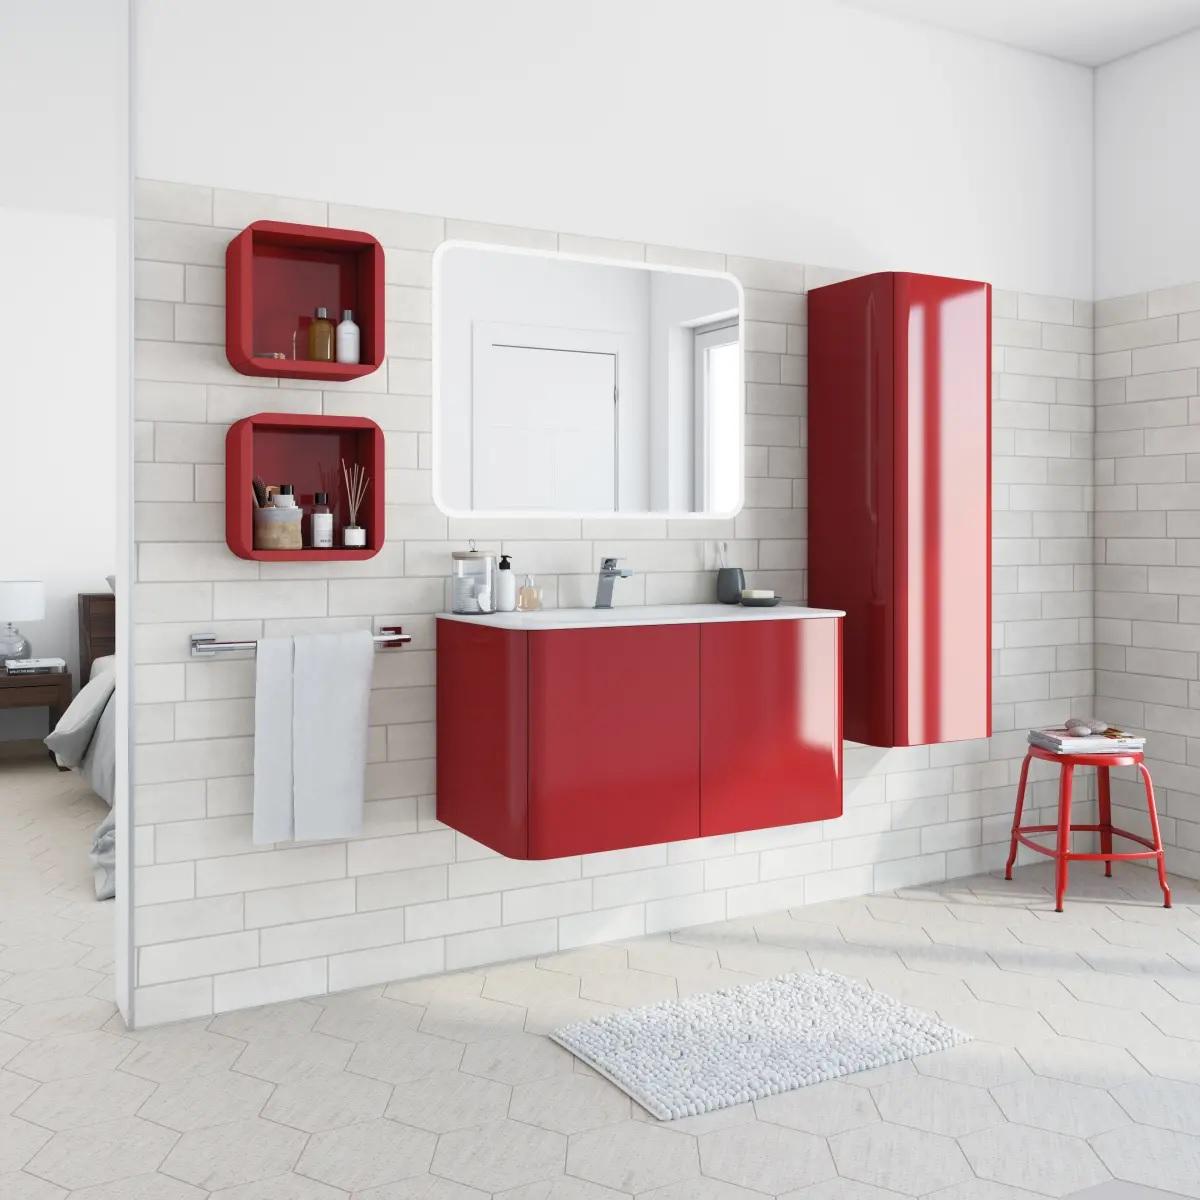 Mobile bagno liverpool rosso leroy merlin habitante for Leroy merlin lavatoio con mobile